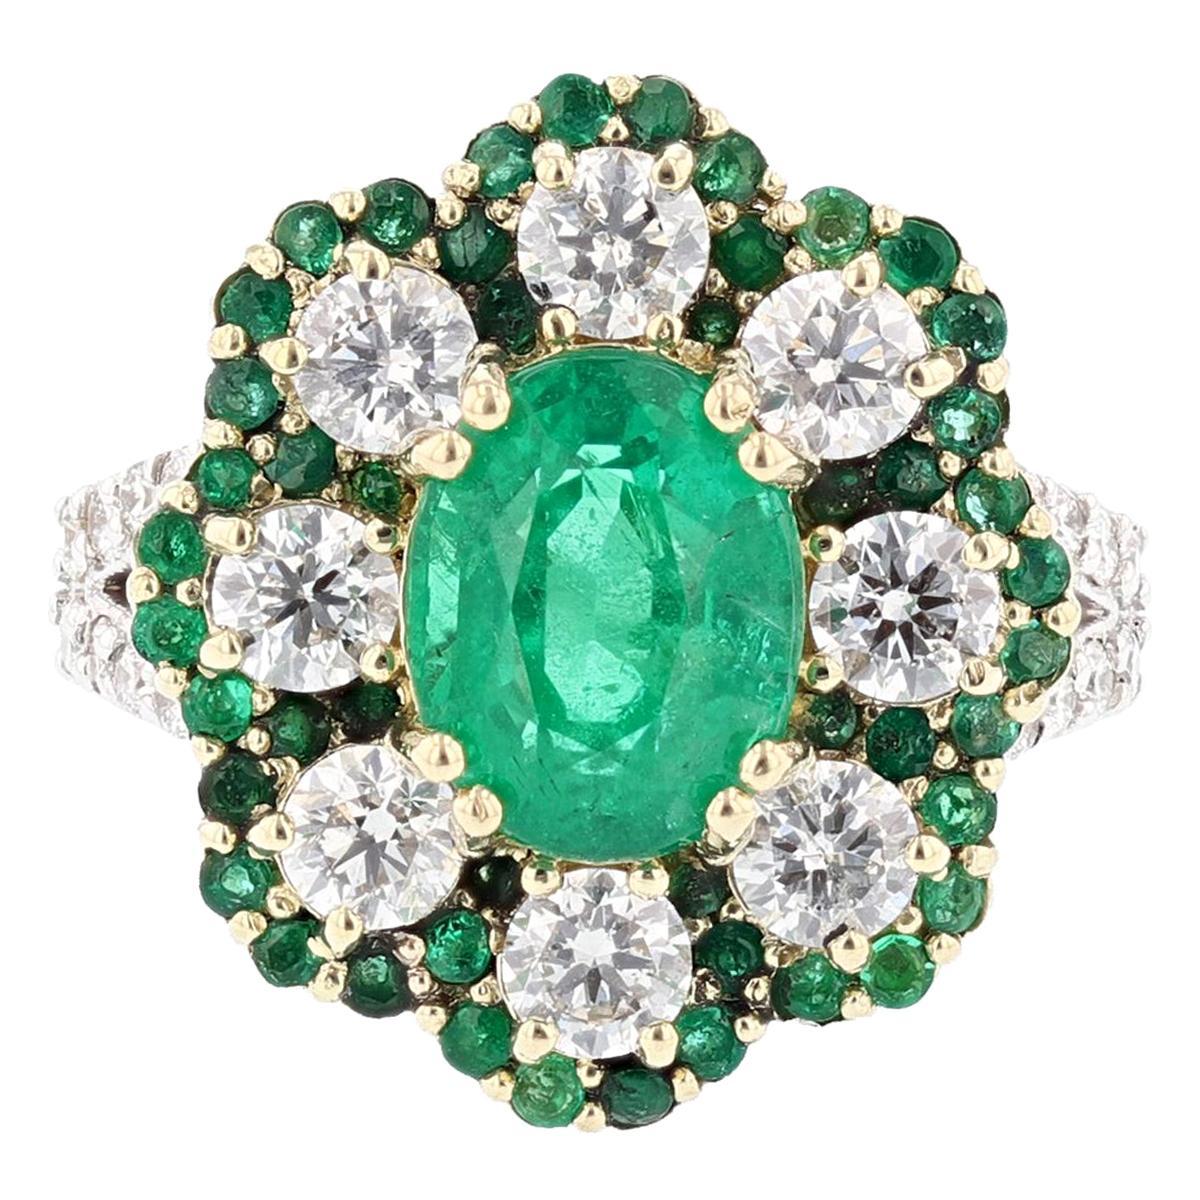 18 Karat White and Yellow Gold 2.66 Carat Emerald Diamond Cocktail Ring